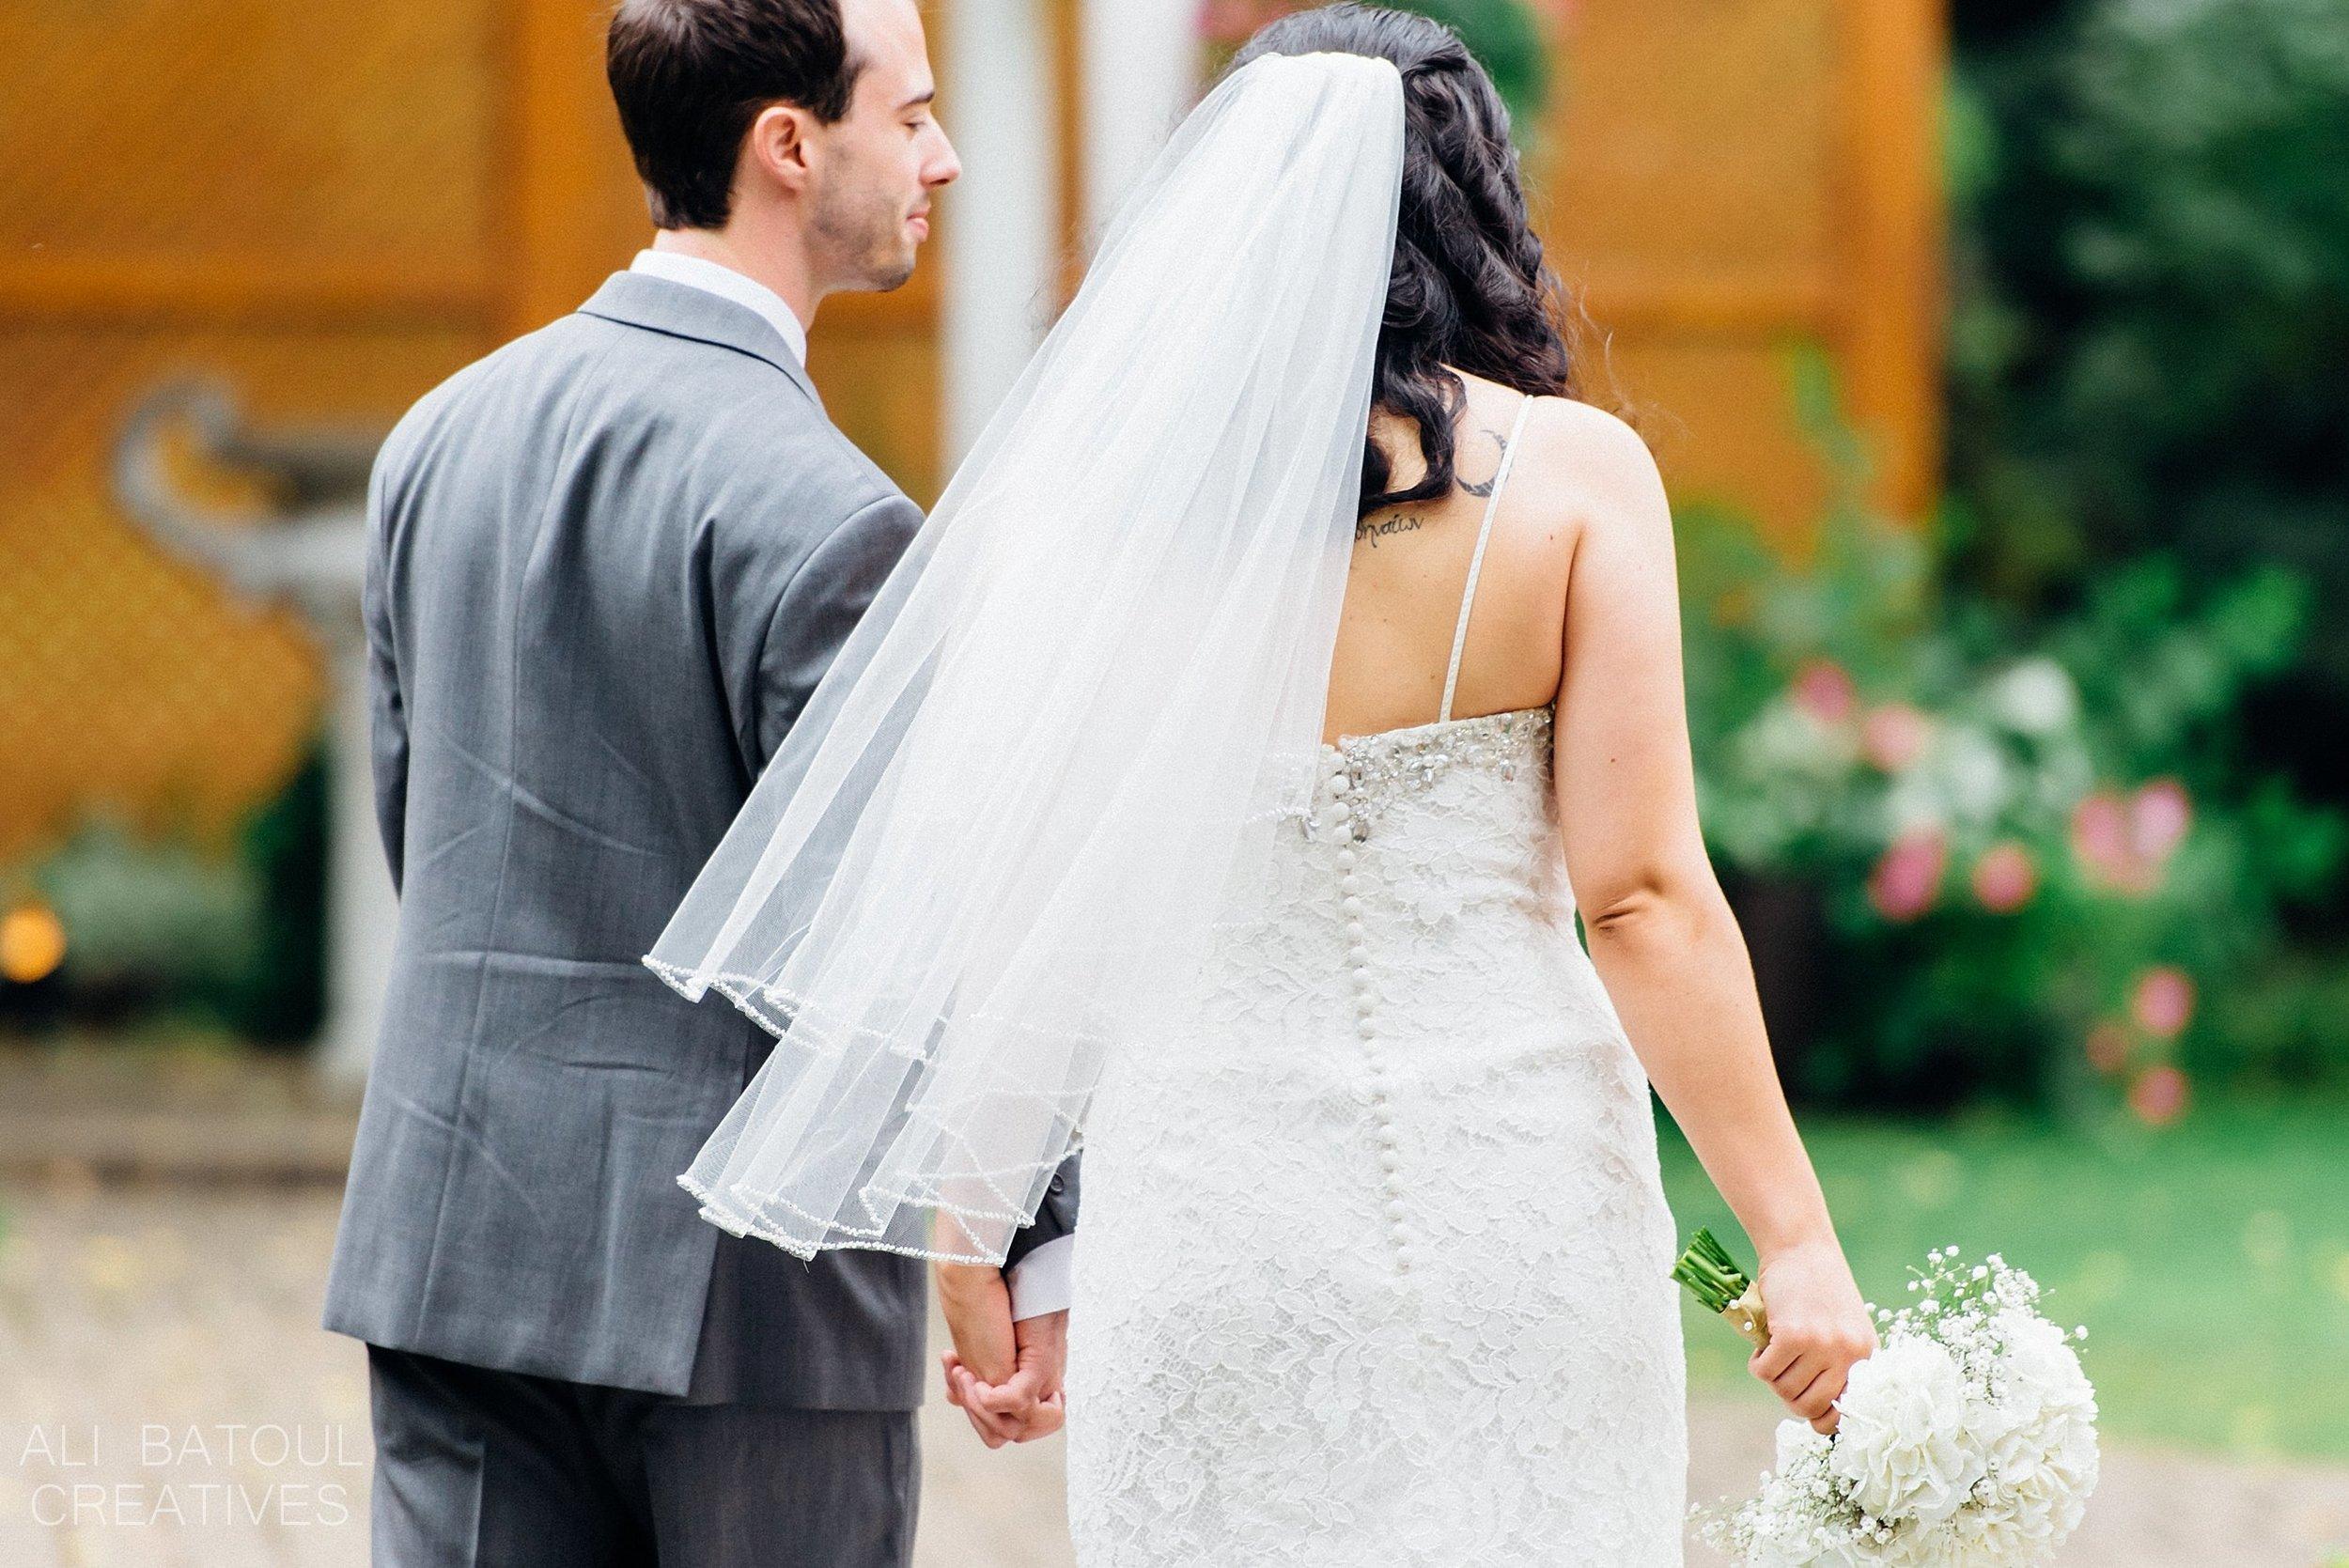 Jocelyn + Steve At The Schoolhouse Wedding - Ali and Batoul Fine Art Wedding Photography_0039.jpg